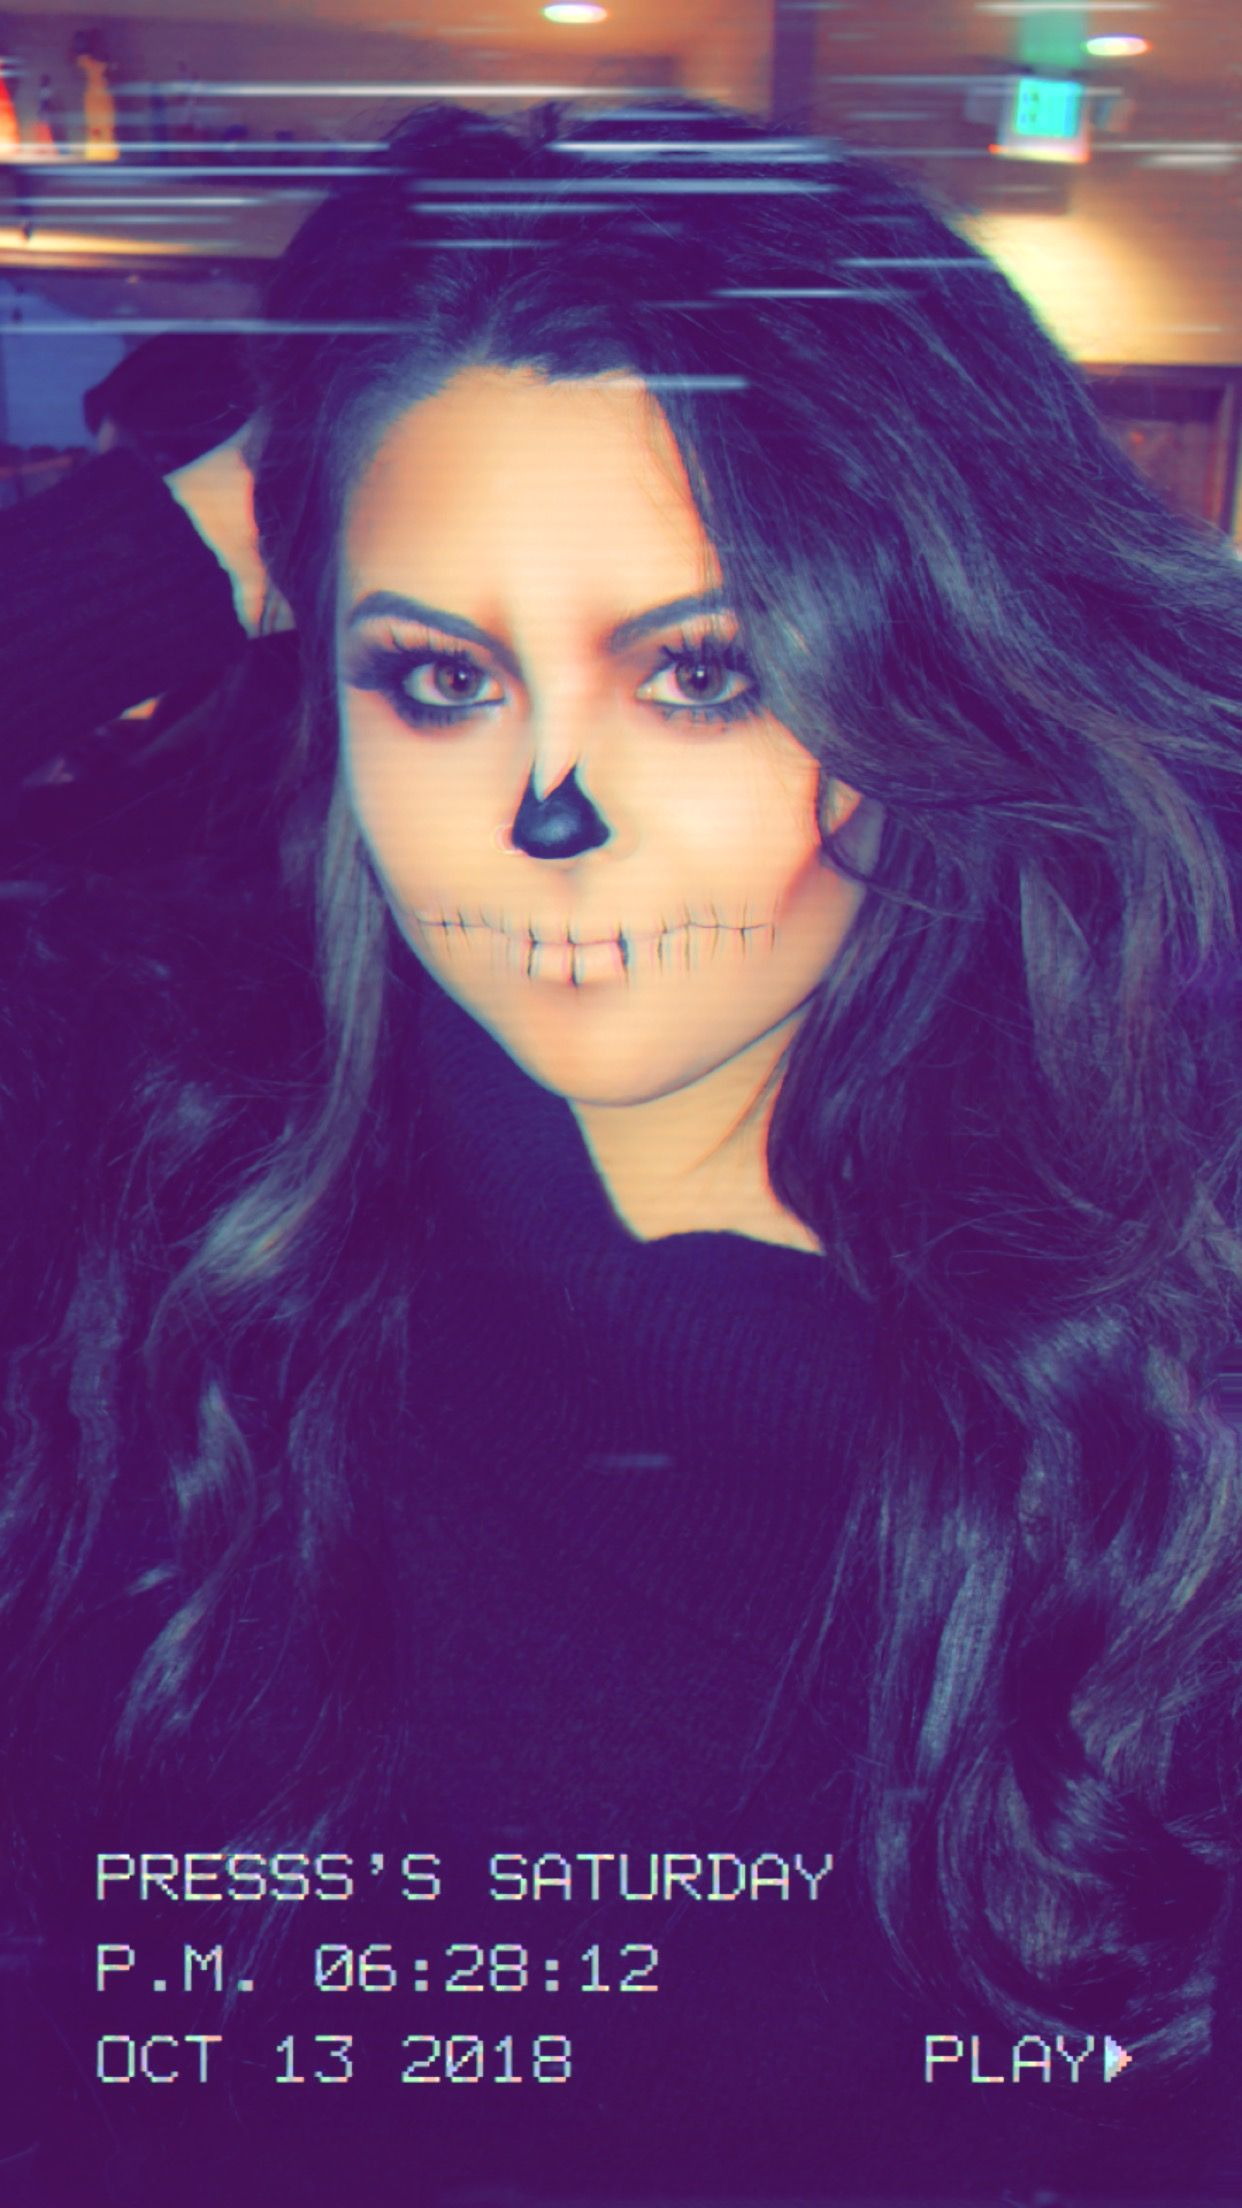 Pin by Presley Bowen on HALLOWEEN Halloween face